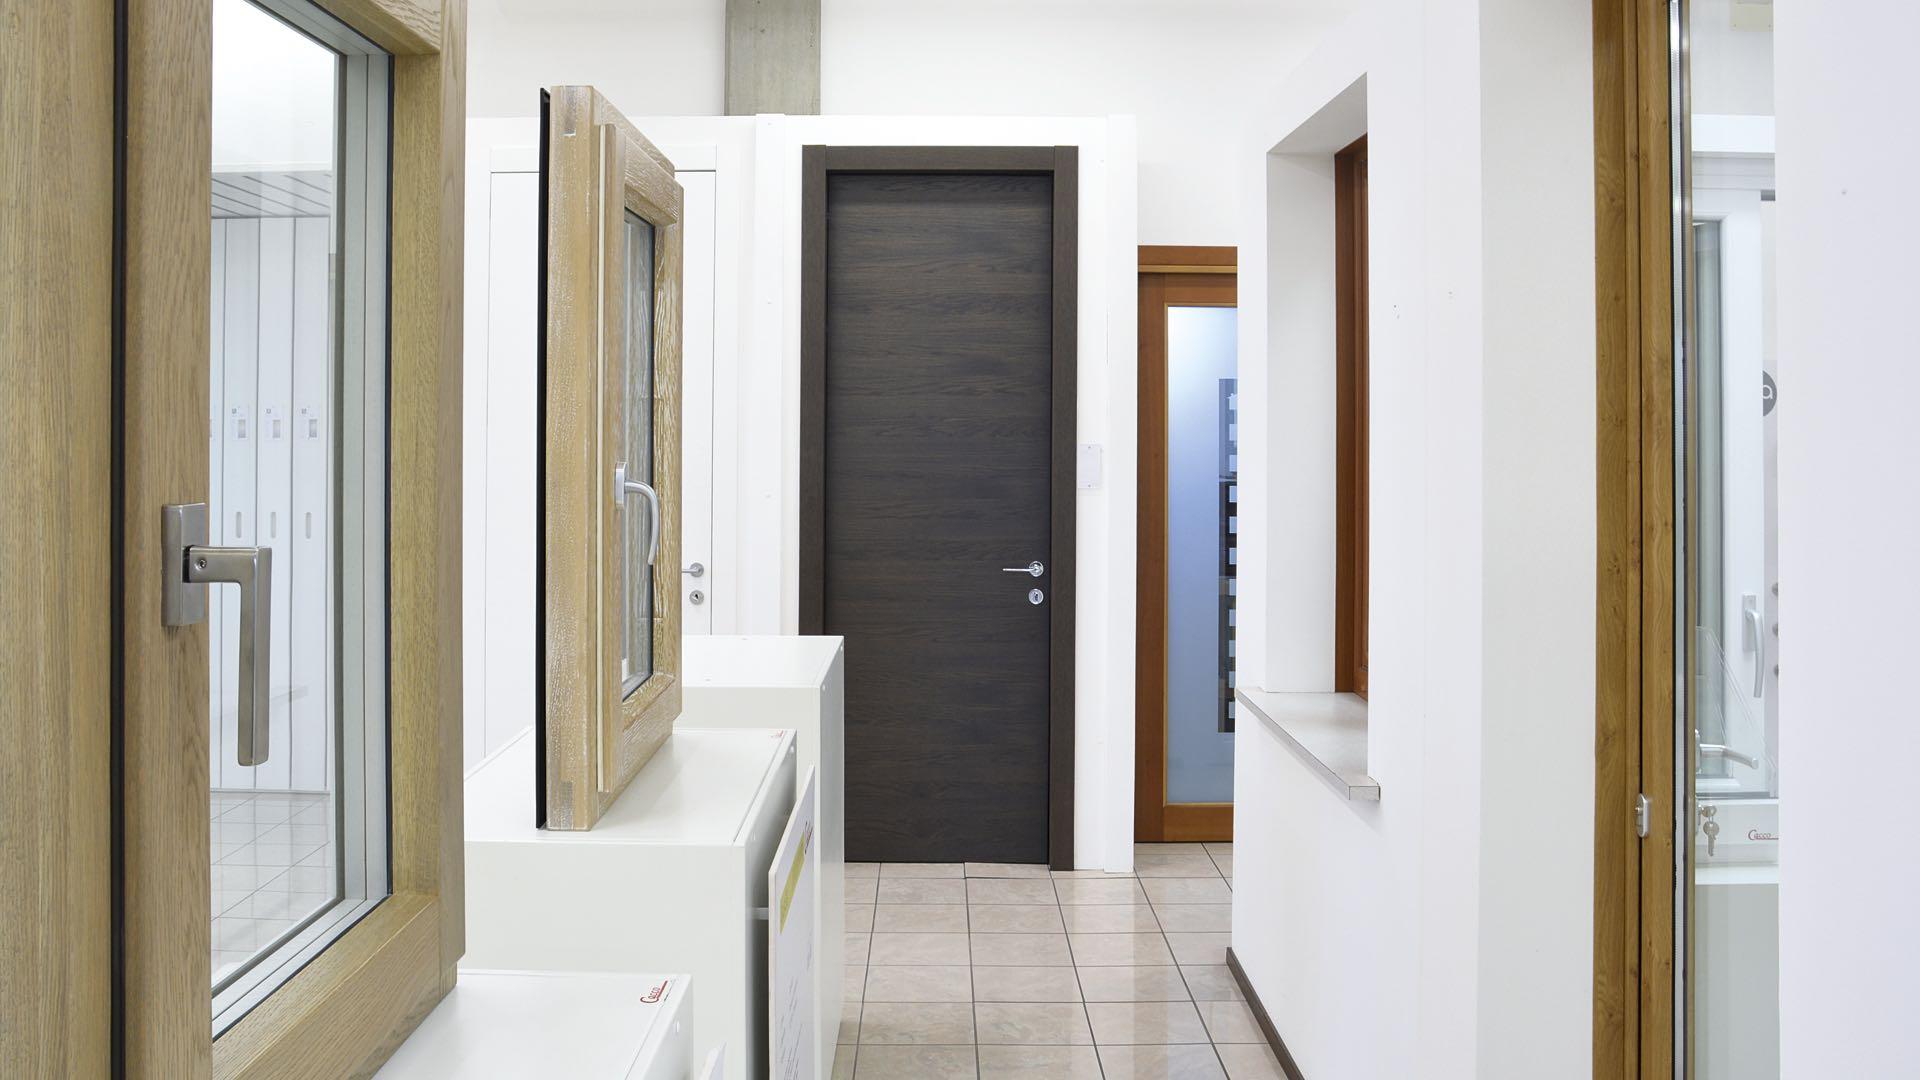 Showroom serramenti finestre porte interne e blindate - Spi porte e finestre ...